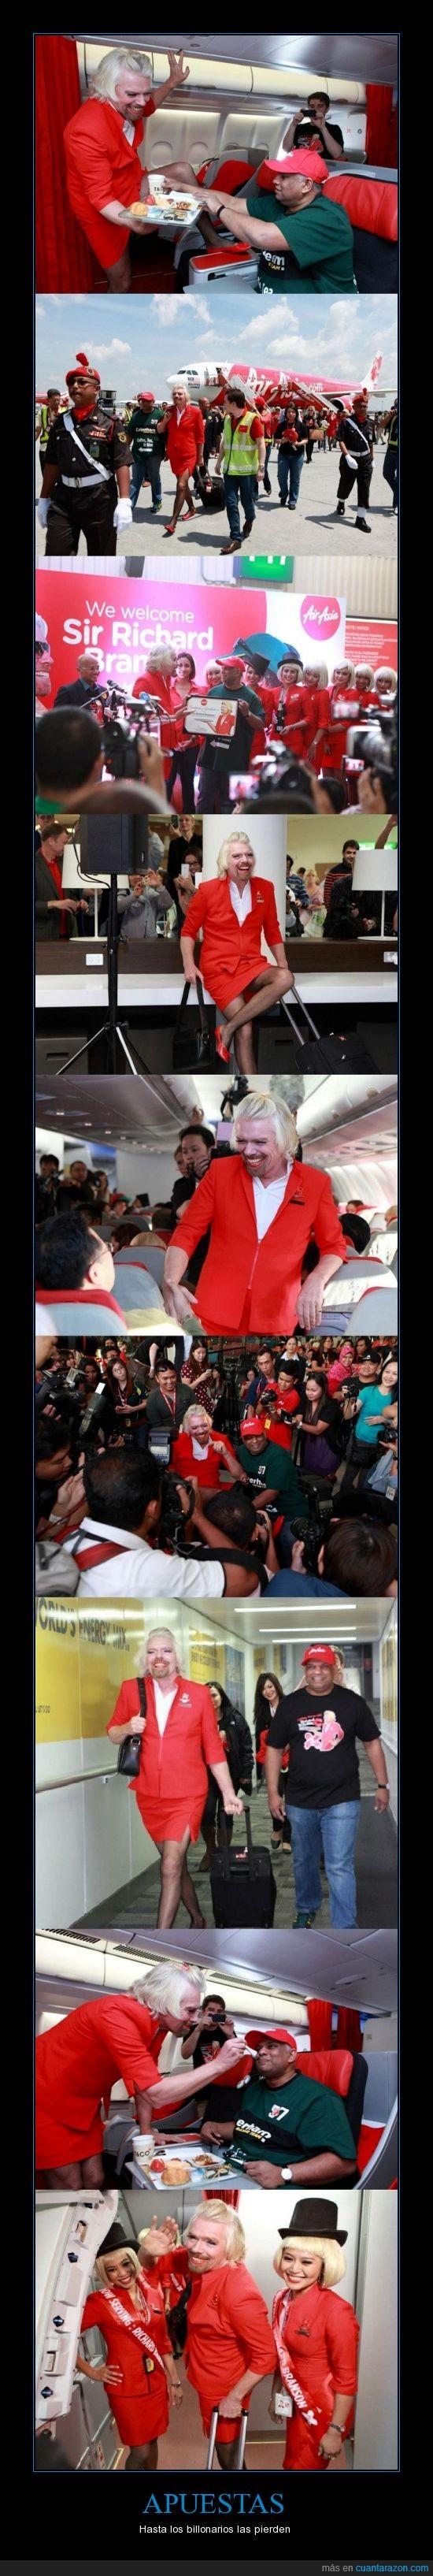 apuestas,avion,azafata,billonarios,millonarios. ricos,Sir Richard Branson,vuelo